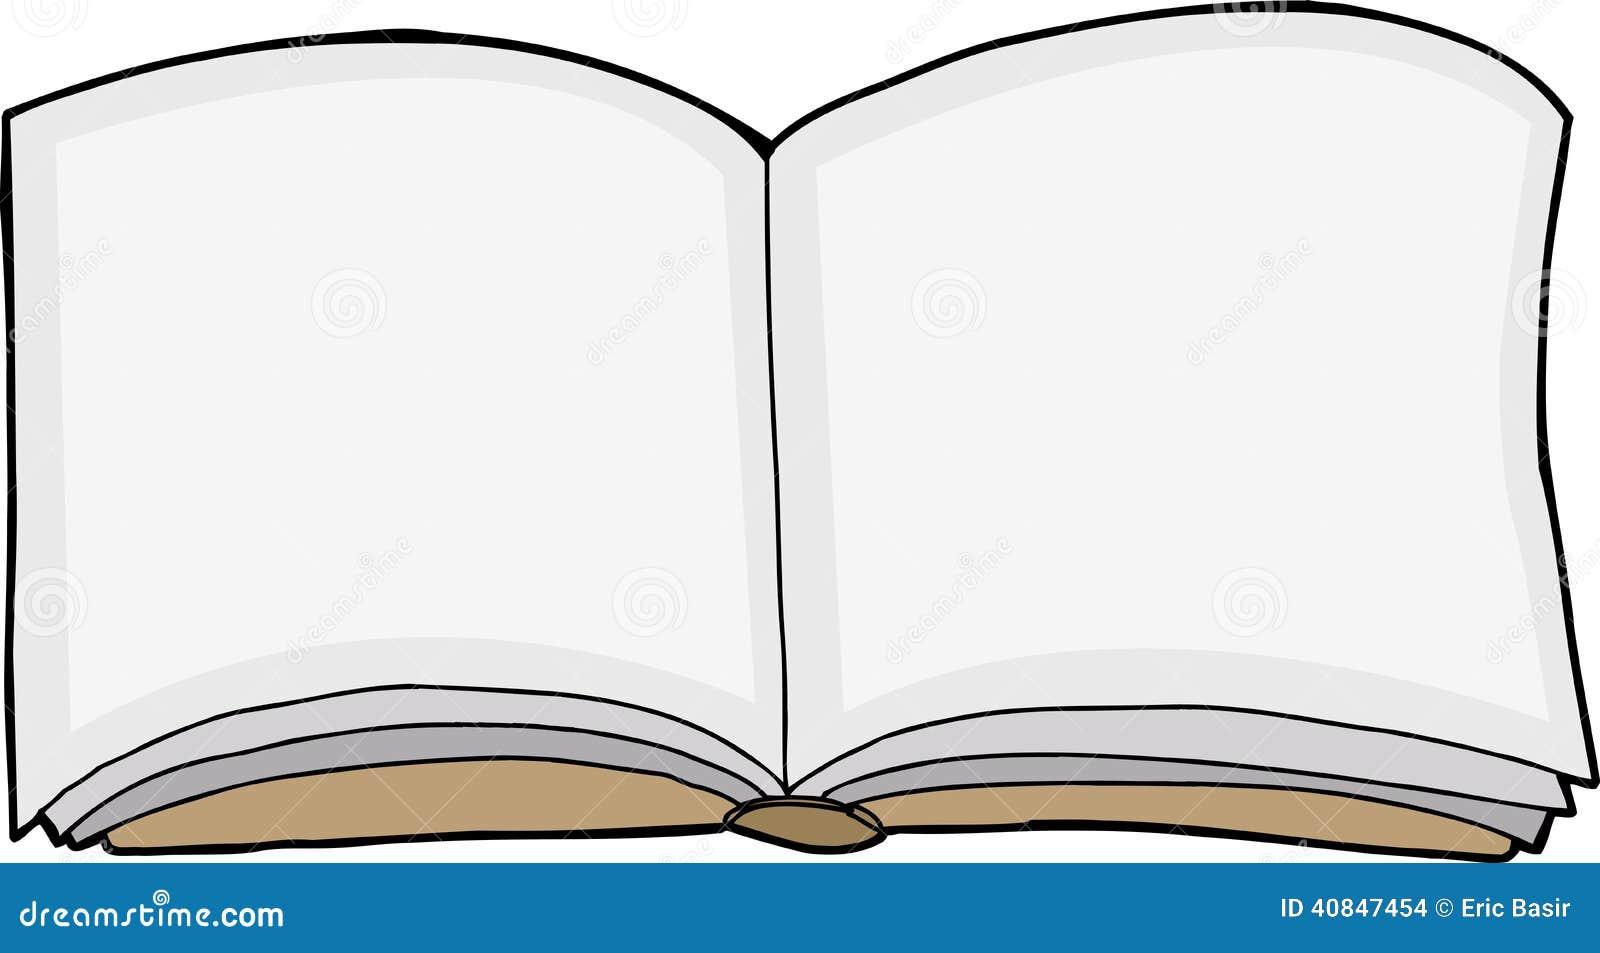 open book cartoon clipart - photo #45